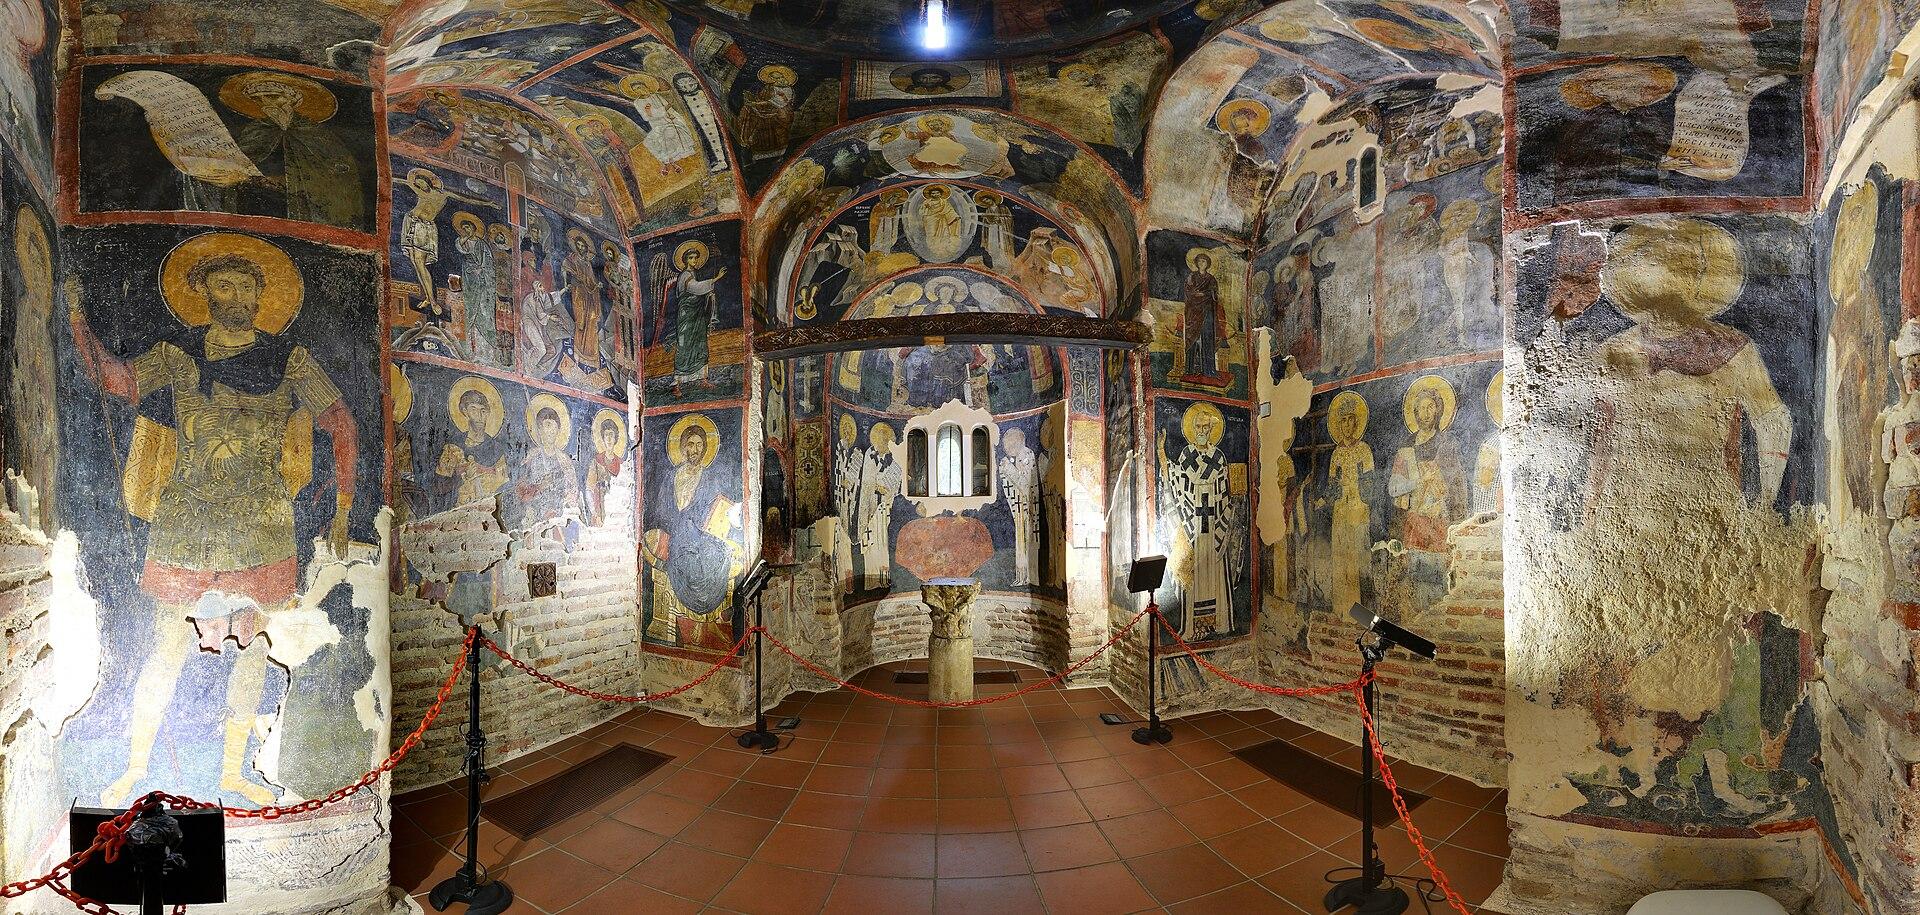 Inside frescoes dating back to 1259, Boyana Church in Sofia, UNESCO World Heritage List landmark.